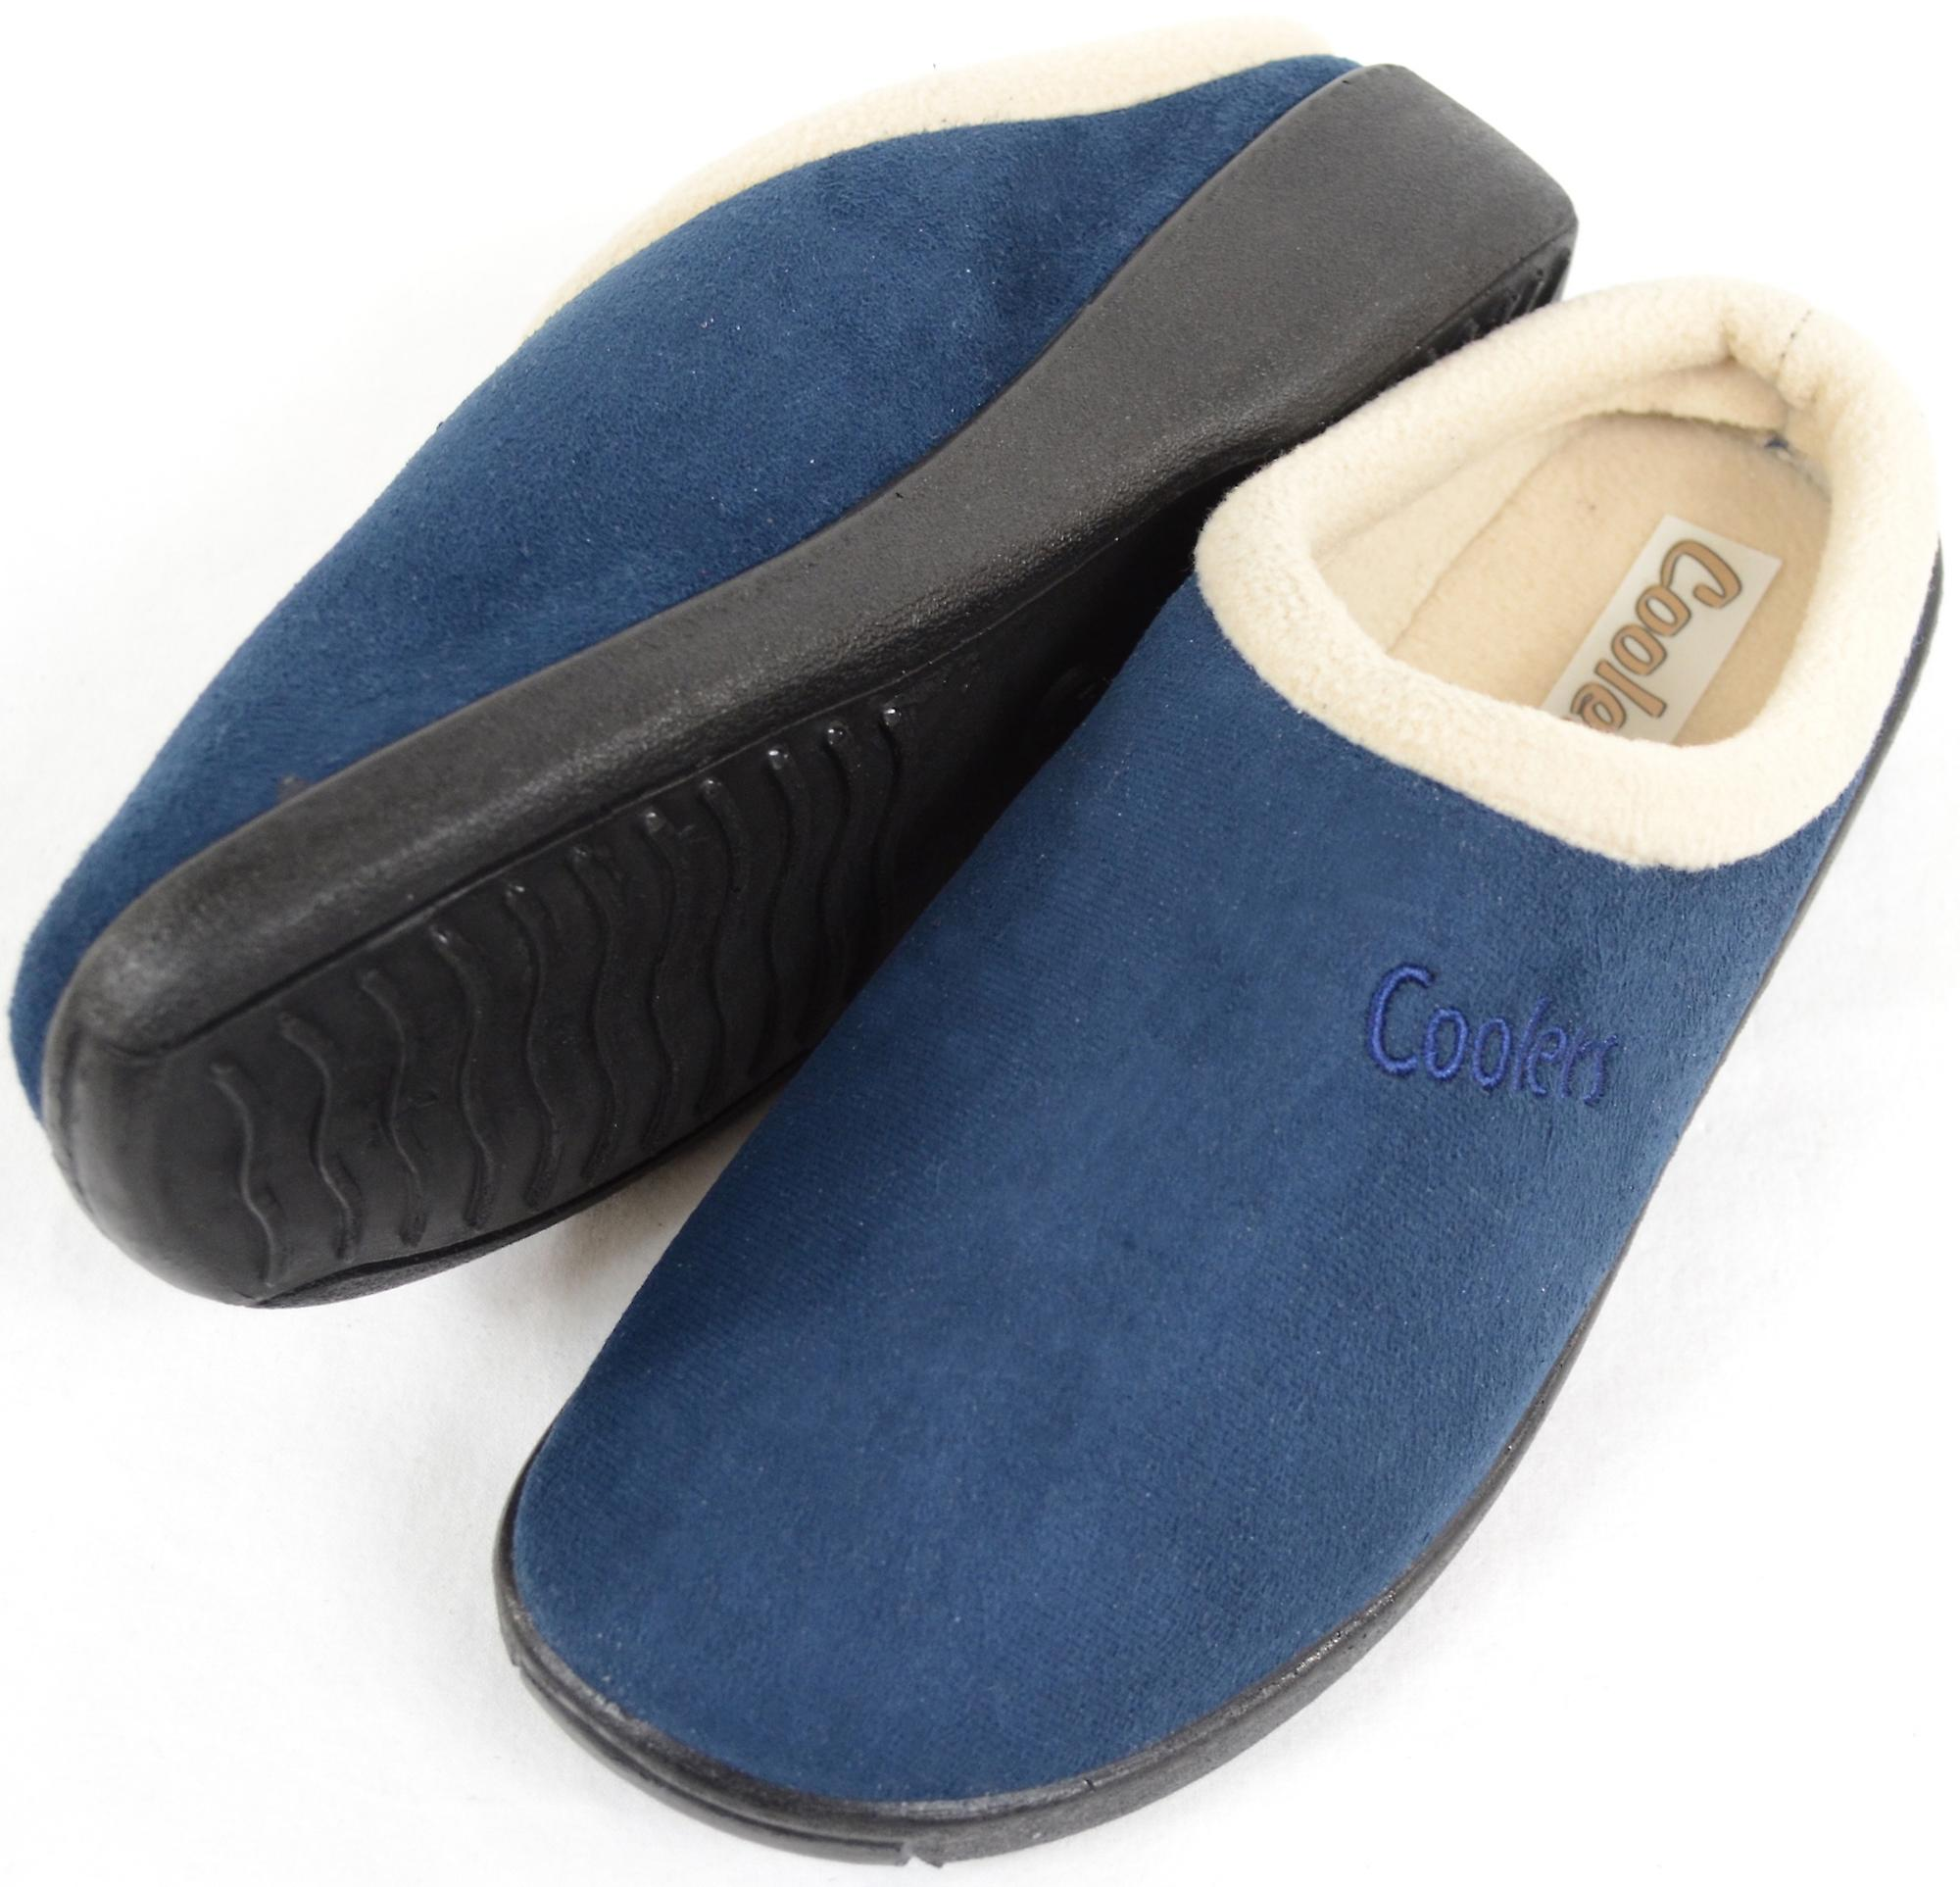 Donna / Womens Slip su pantofole / muli con caldo pile fodera - Navy - UK 7